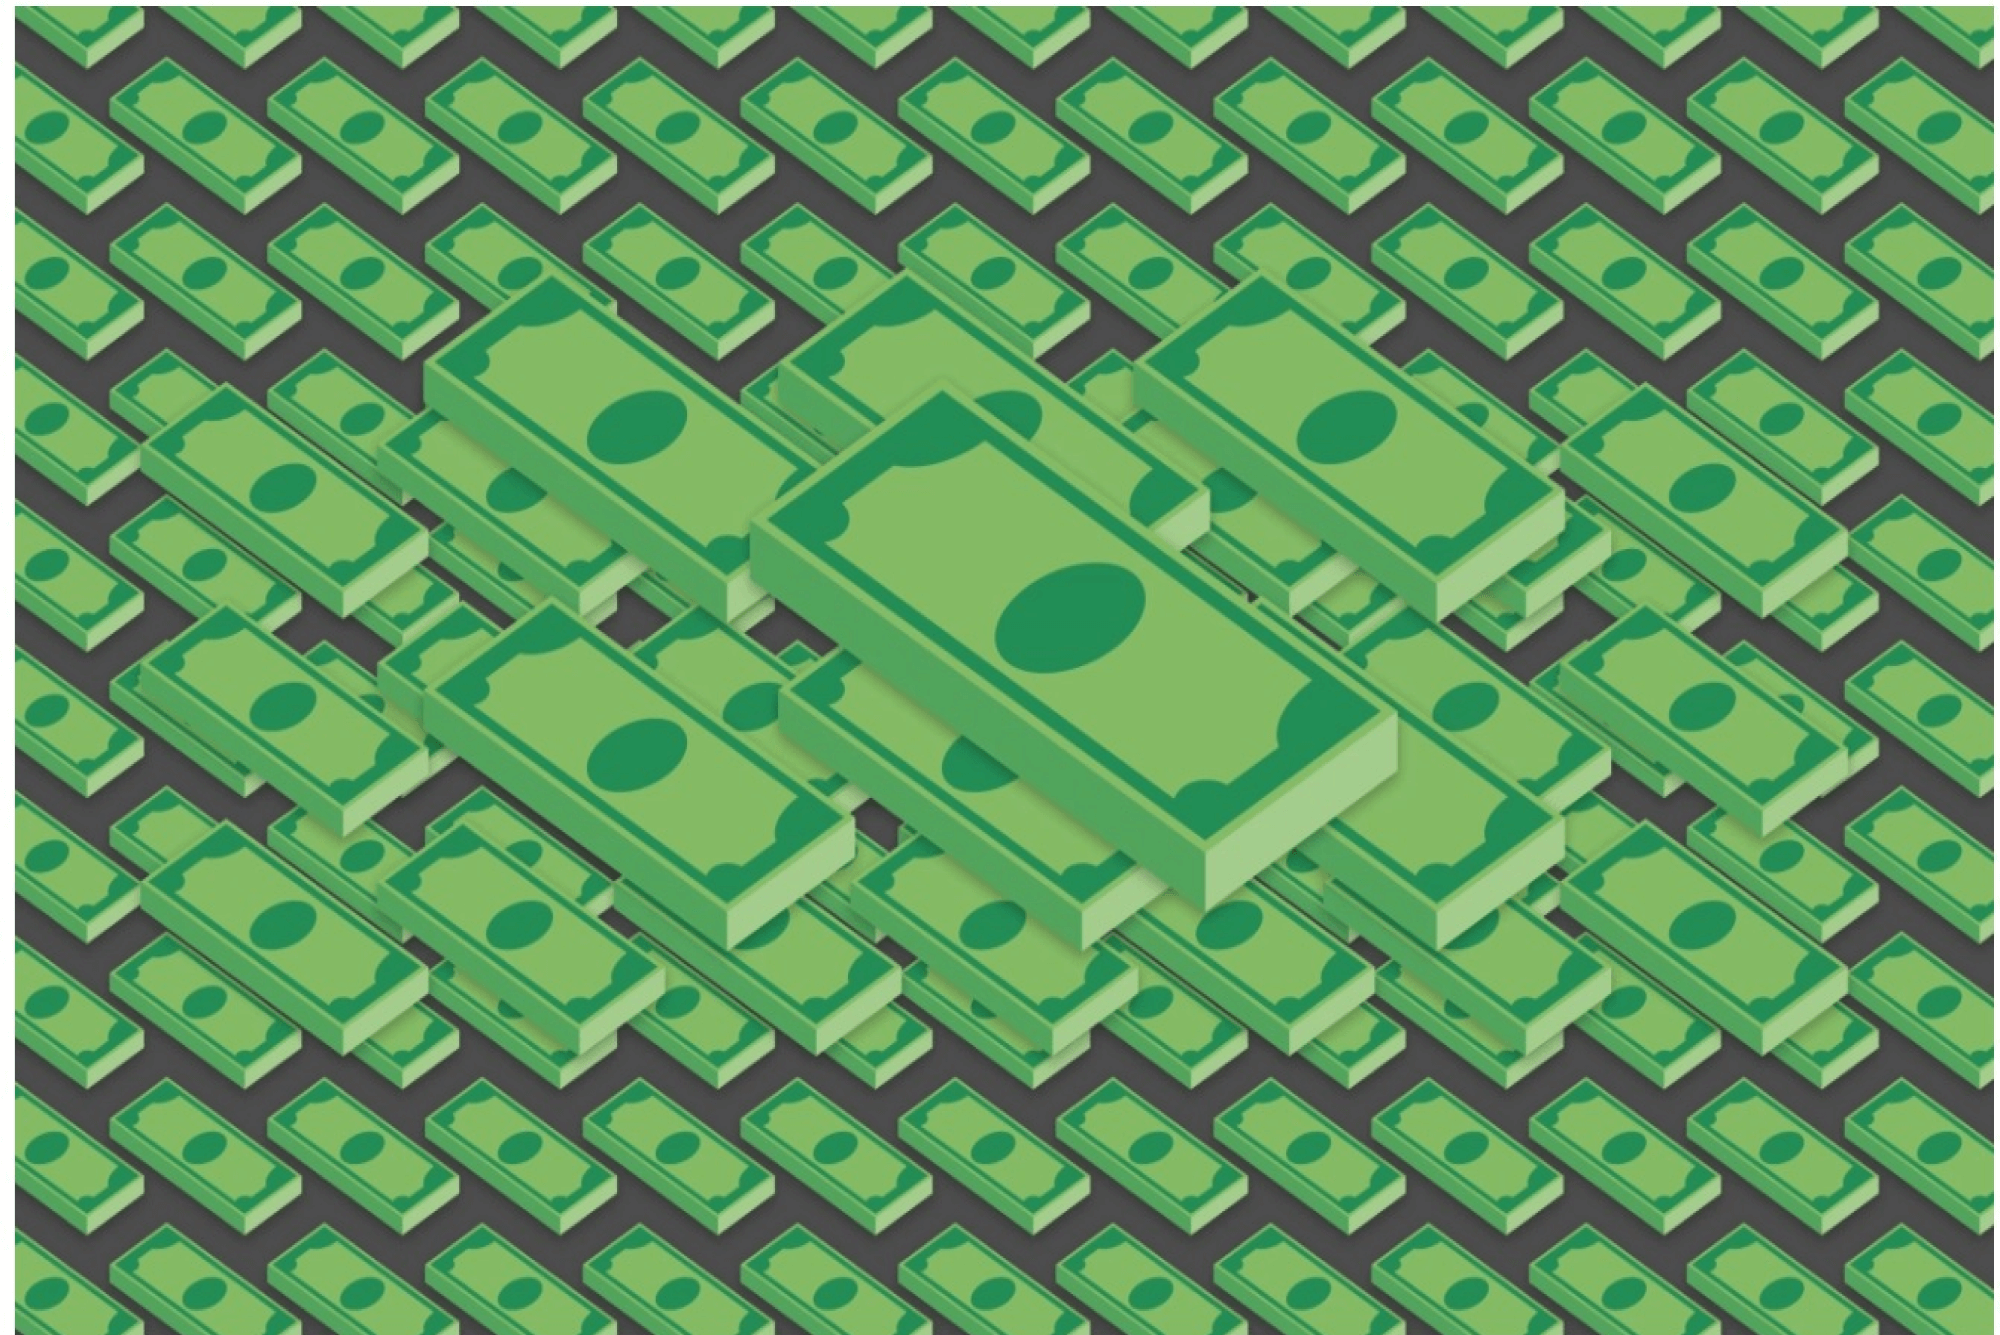 TechCrunch: Balance to Bring B2B Payments into the Digital World